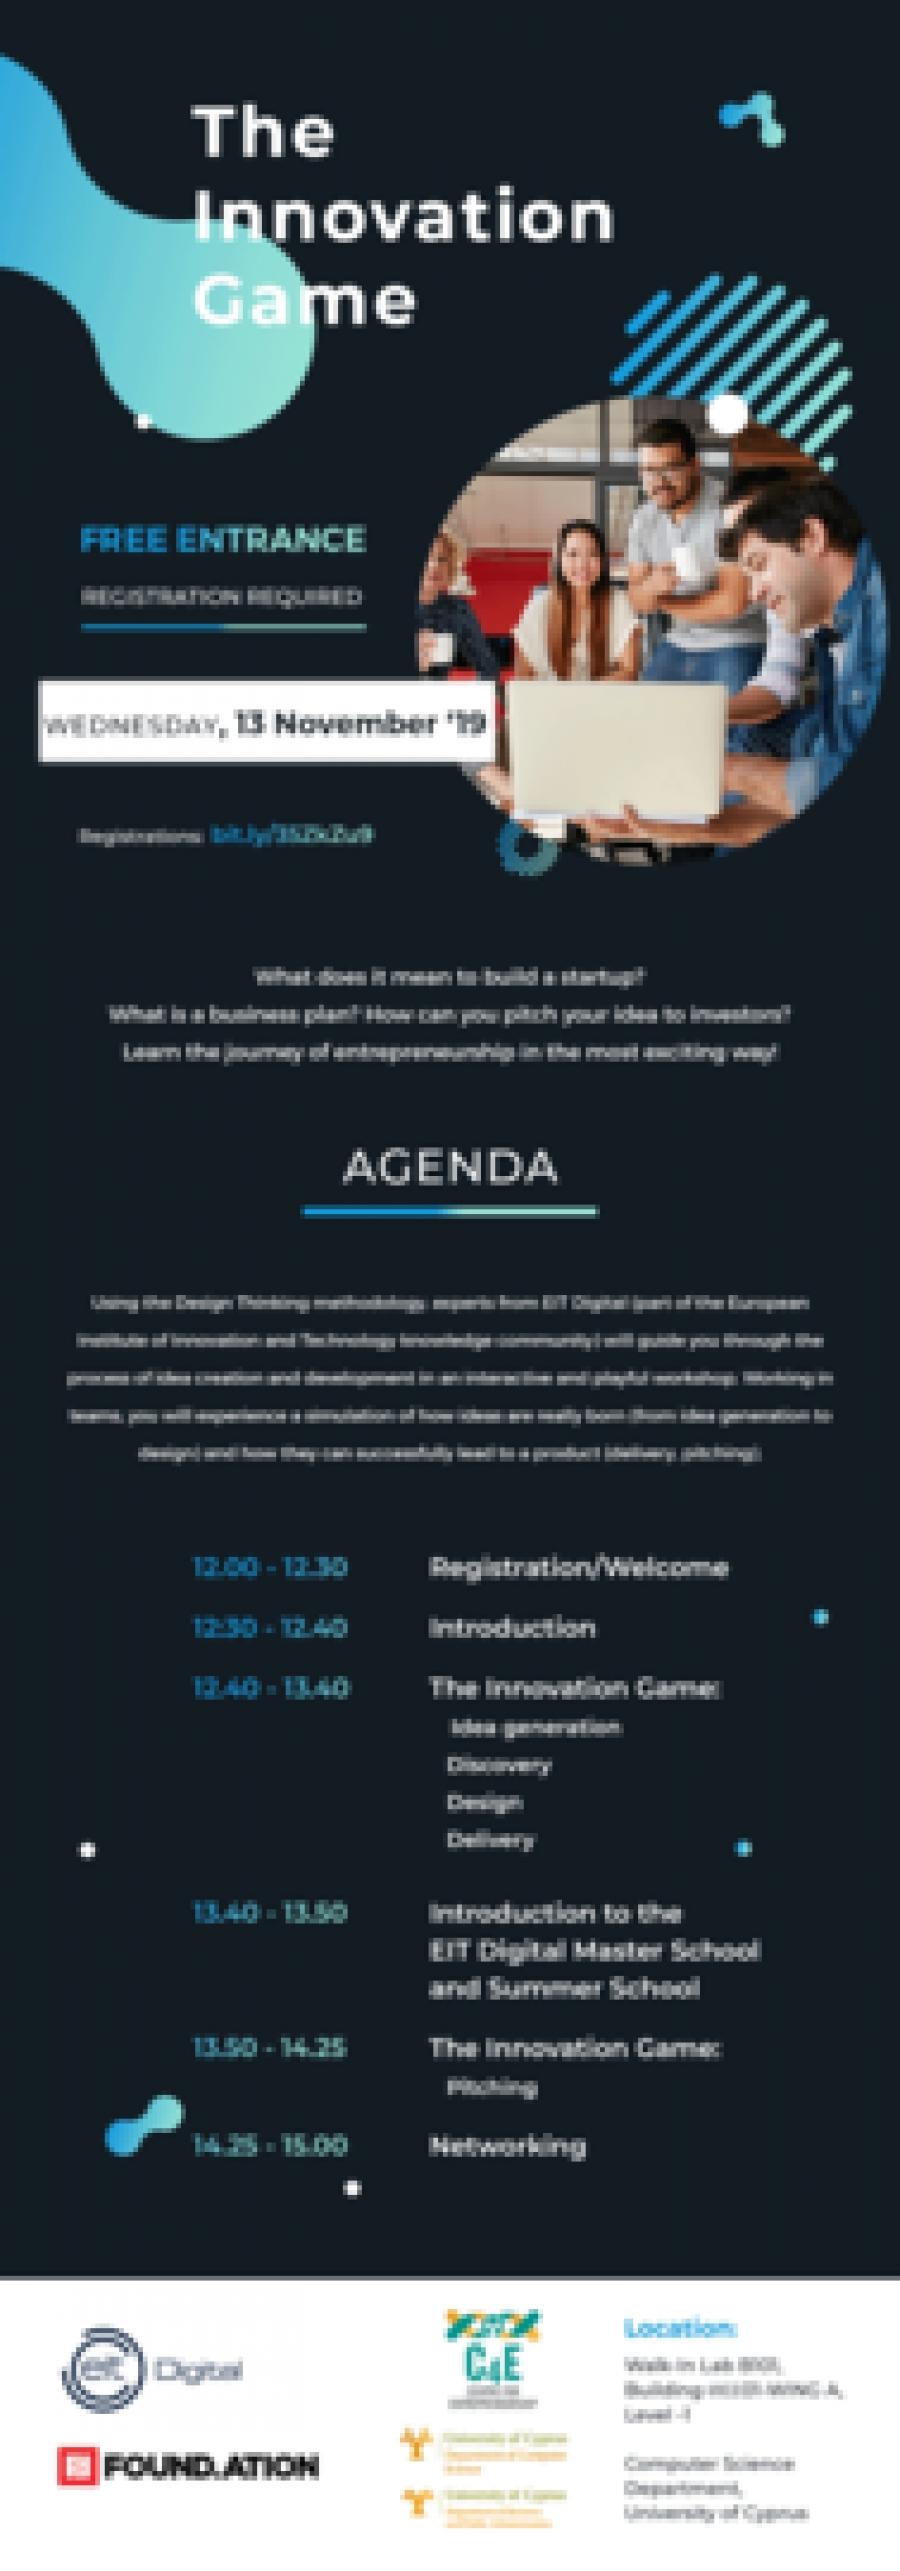 [13 Nov] 'The Innovation Game': Business Modelling Workshop on Idea Generation and Startup Creation